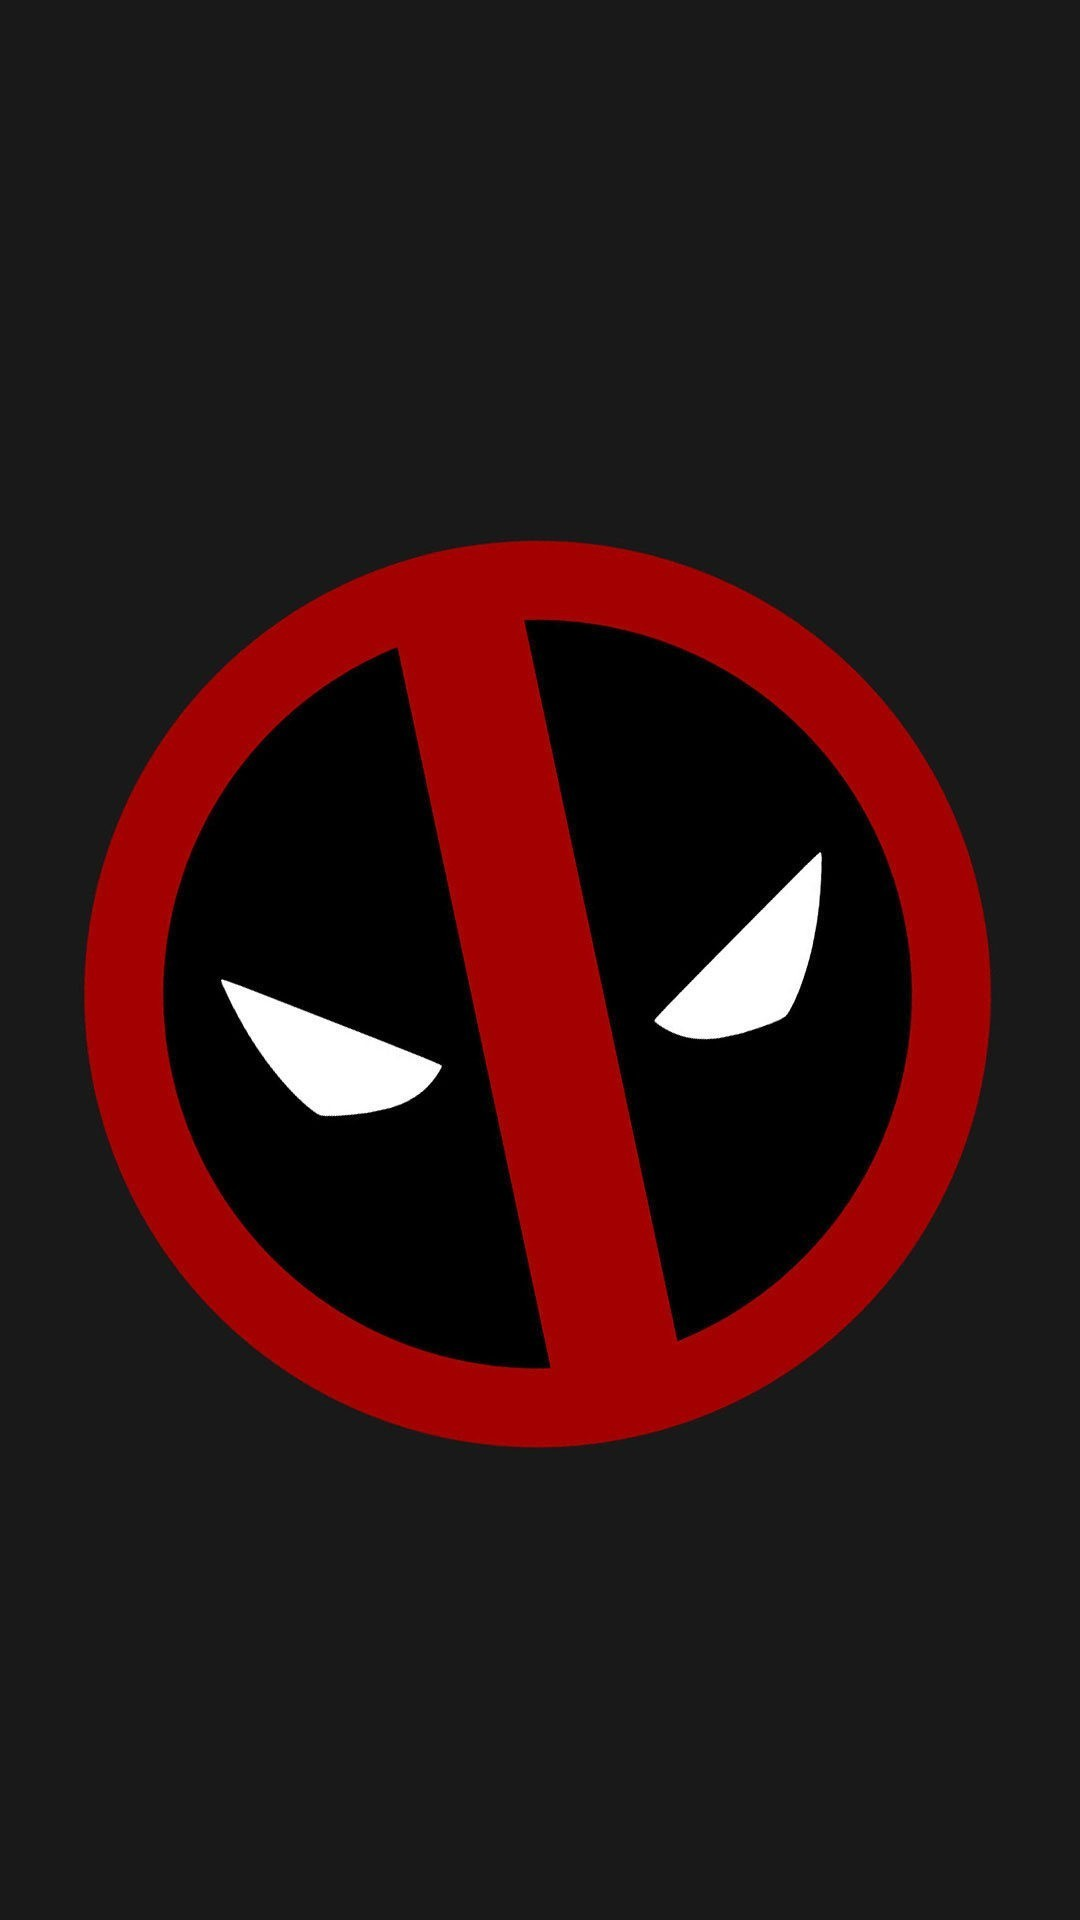 Deadpool Logo Wallpaper Hd Gif